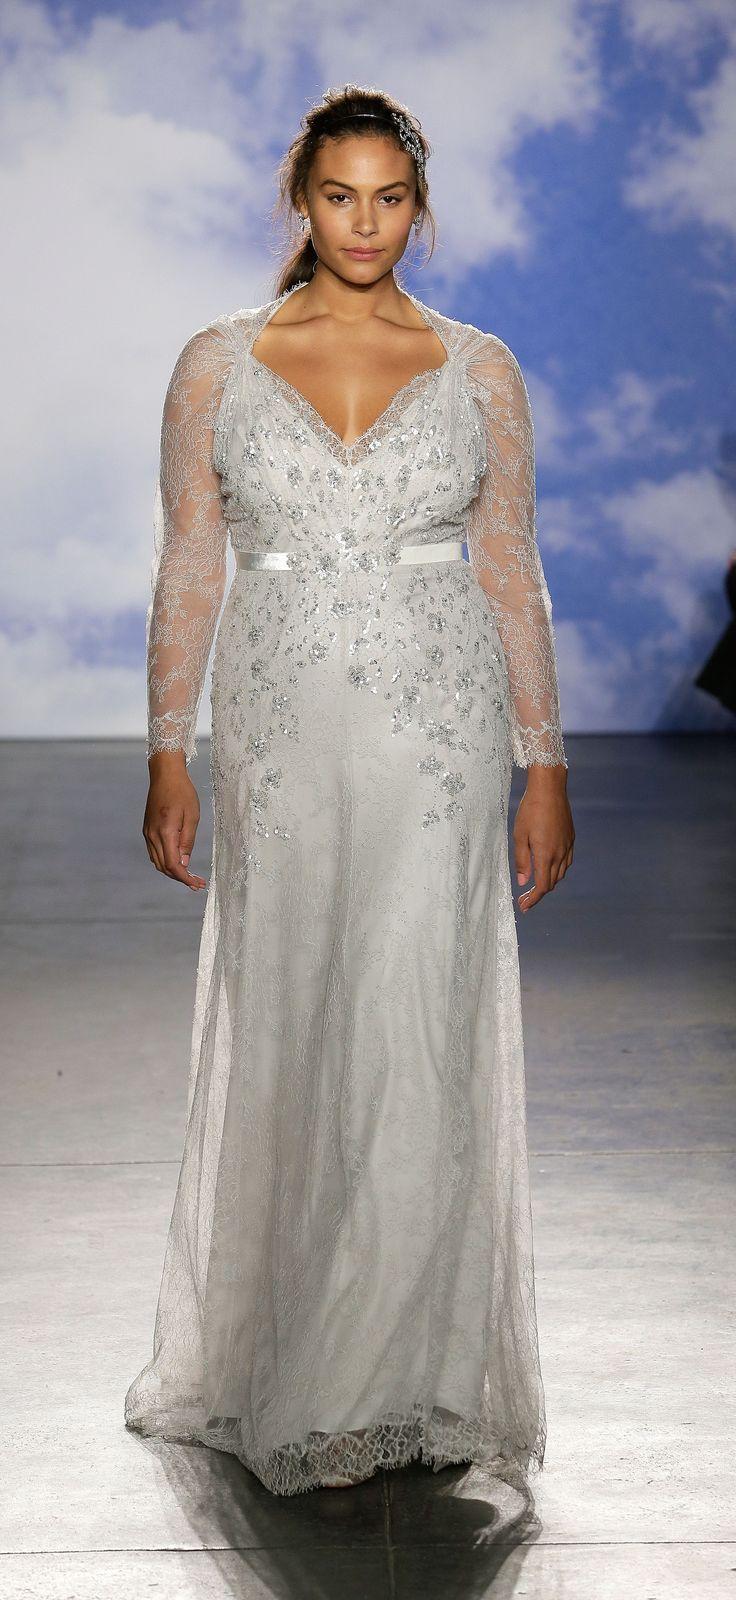 Jenny Packham Gives Plus-Size Brides Some Gorgeous Options | Jenny ...